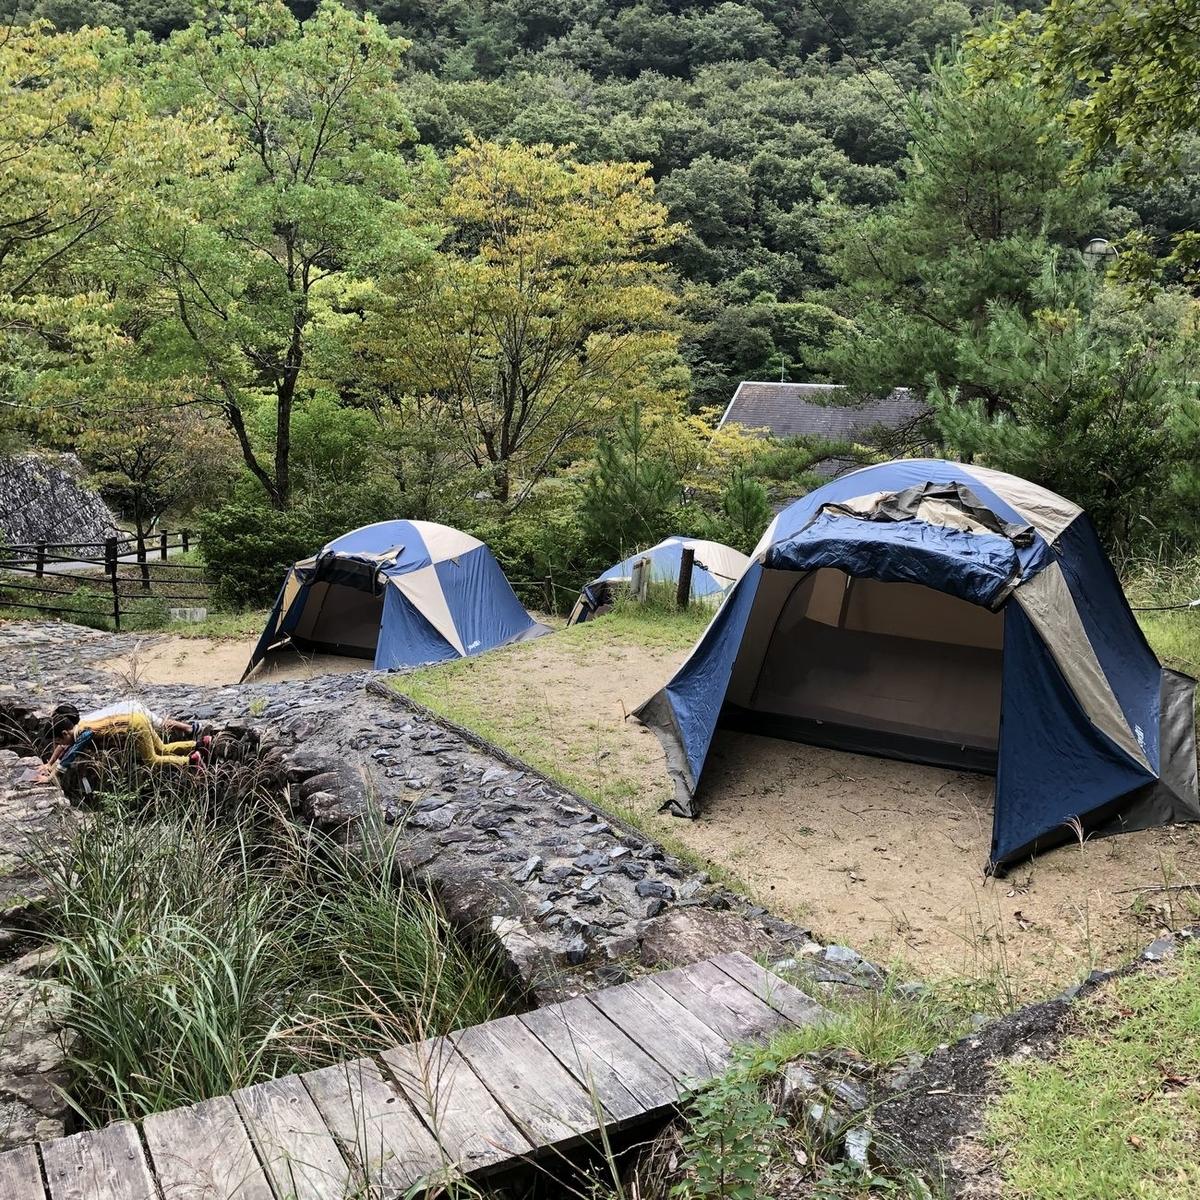 f:id:shiratsume:20190930213200j:plain